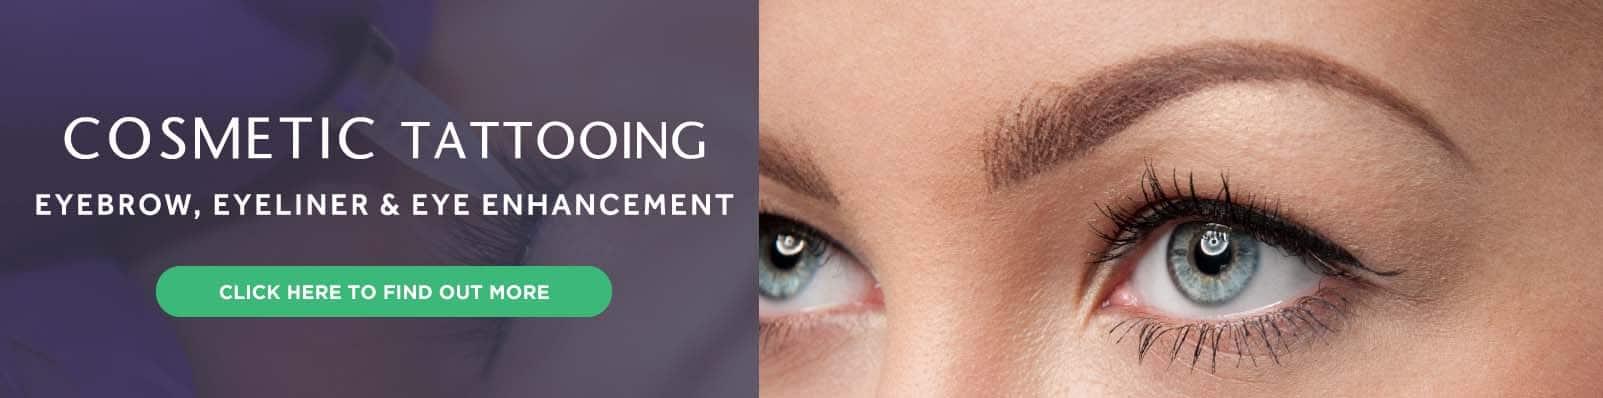 cosmetic eyebrow tattooing